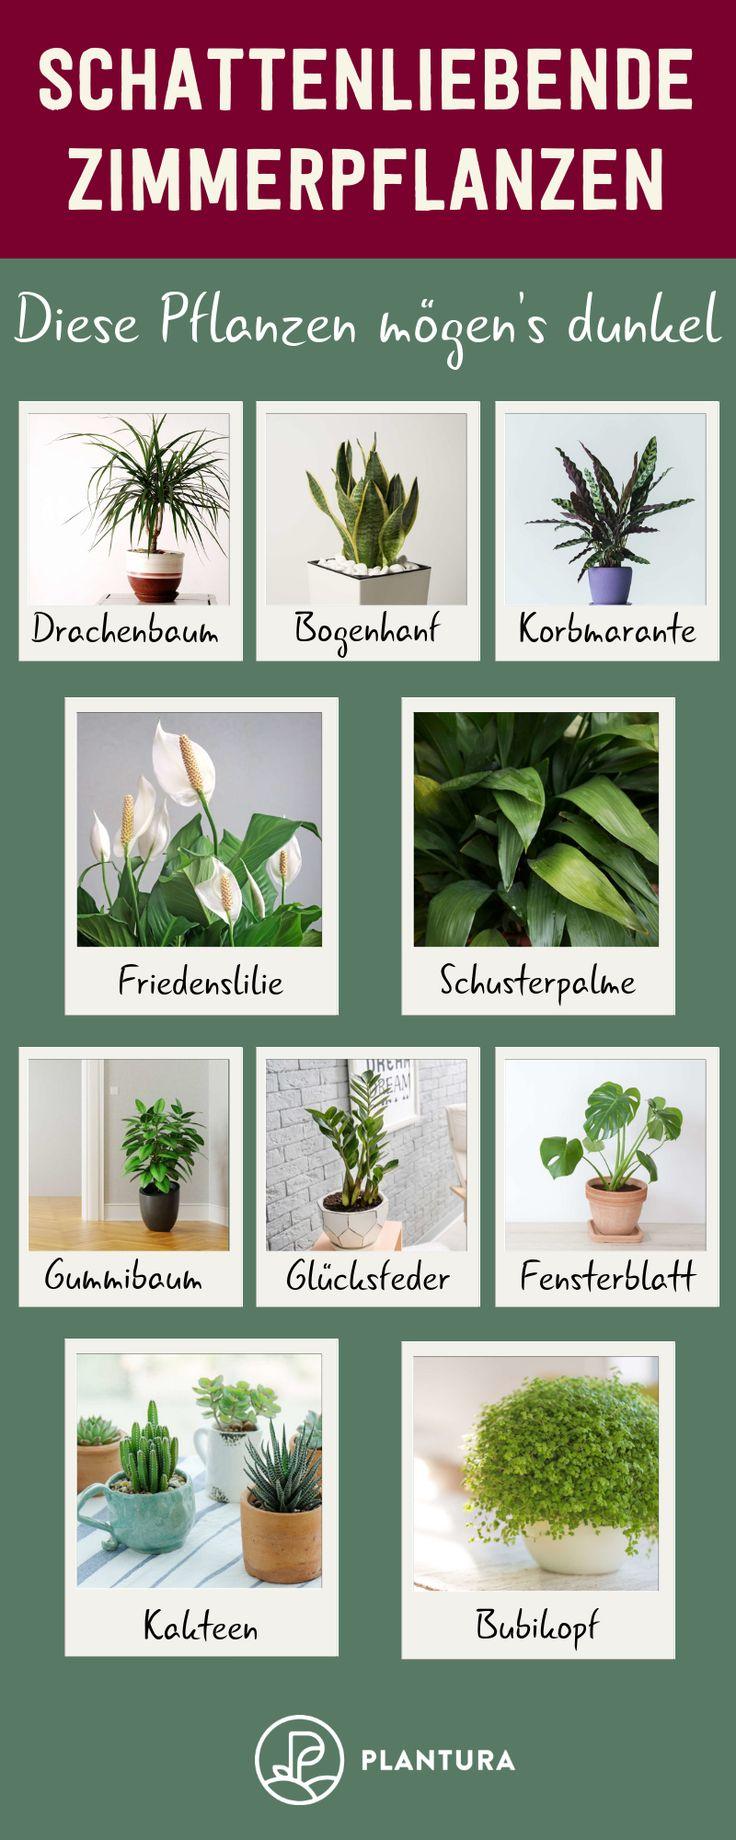 Schattenliebende Zimmerpflanzen: Unsere Top 10 – Plantura | Garten Ideen & Tipps | Gemüse, Obst, Kräuter